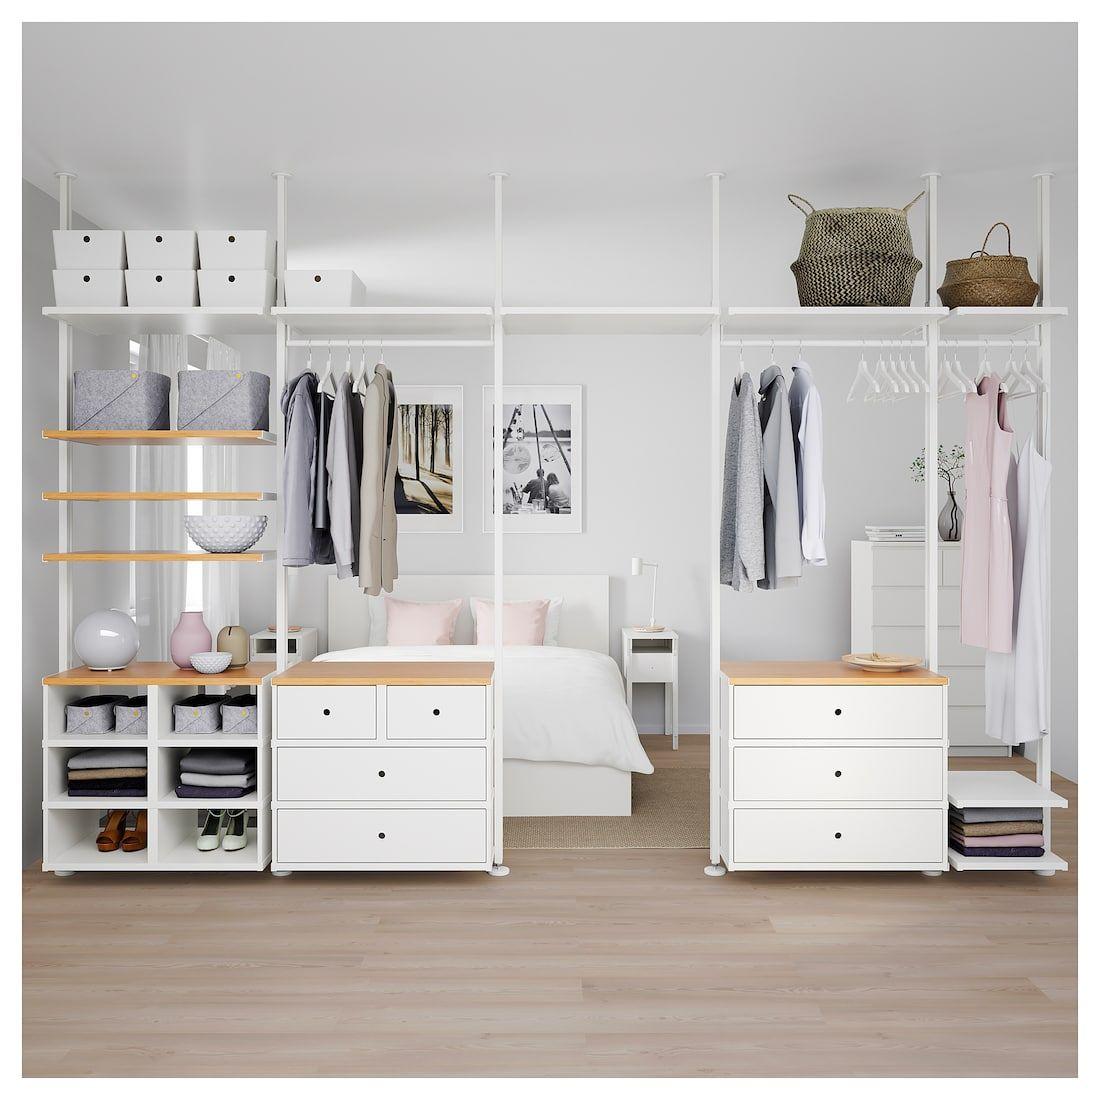 Ikea Us Furniture And Home Furnishings Living Room Diy Ikea Closet Room Closet